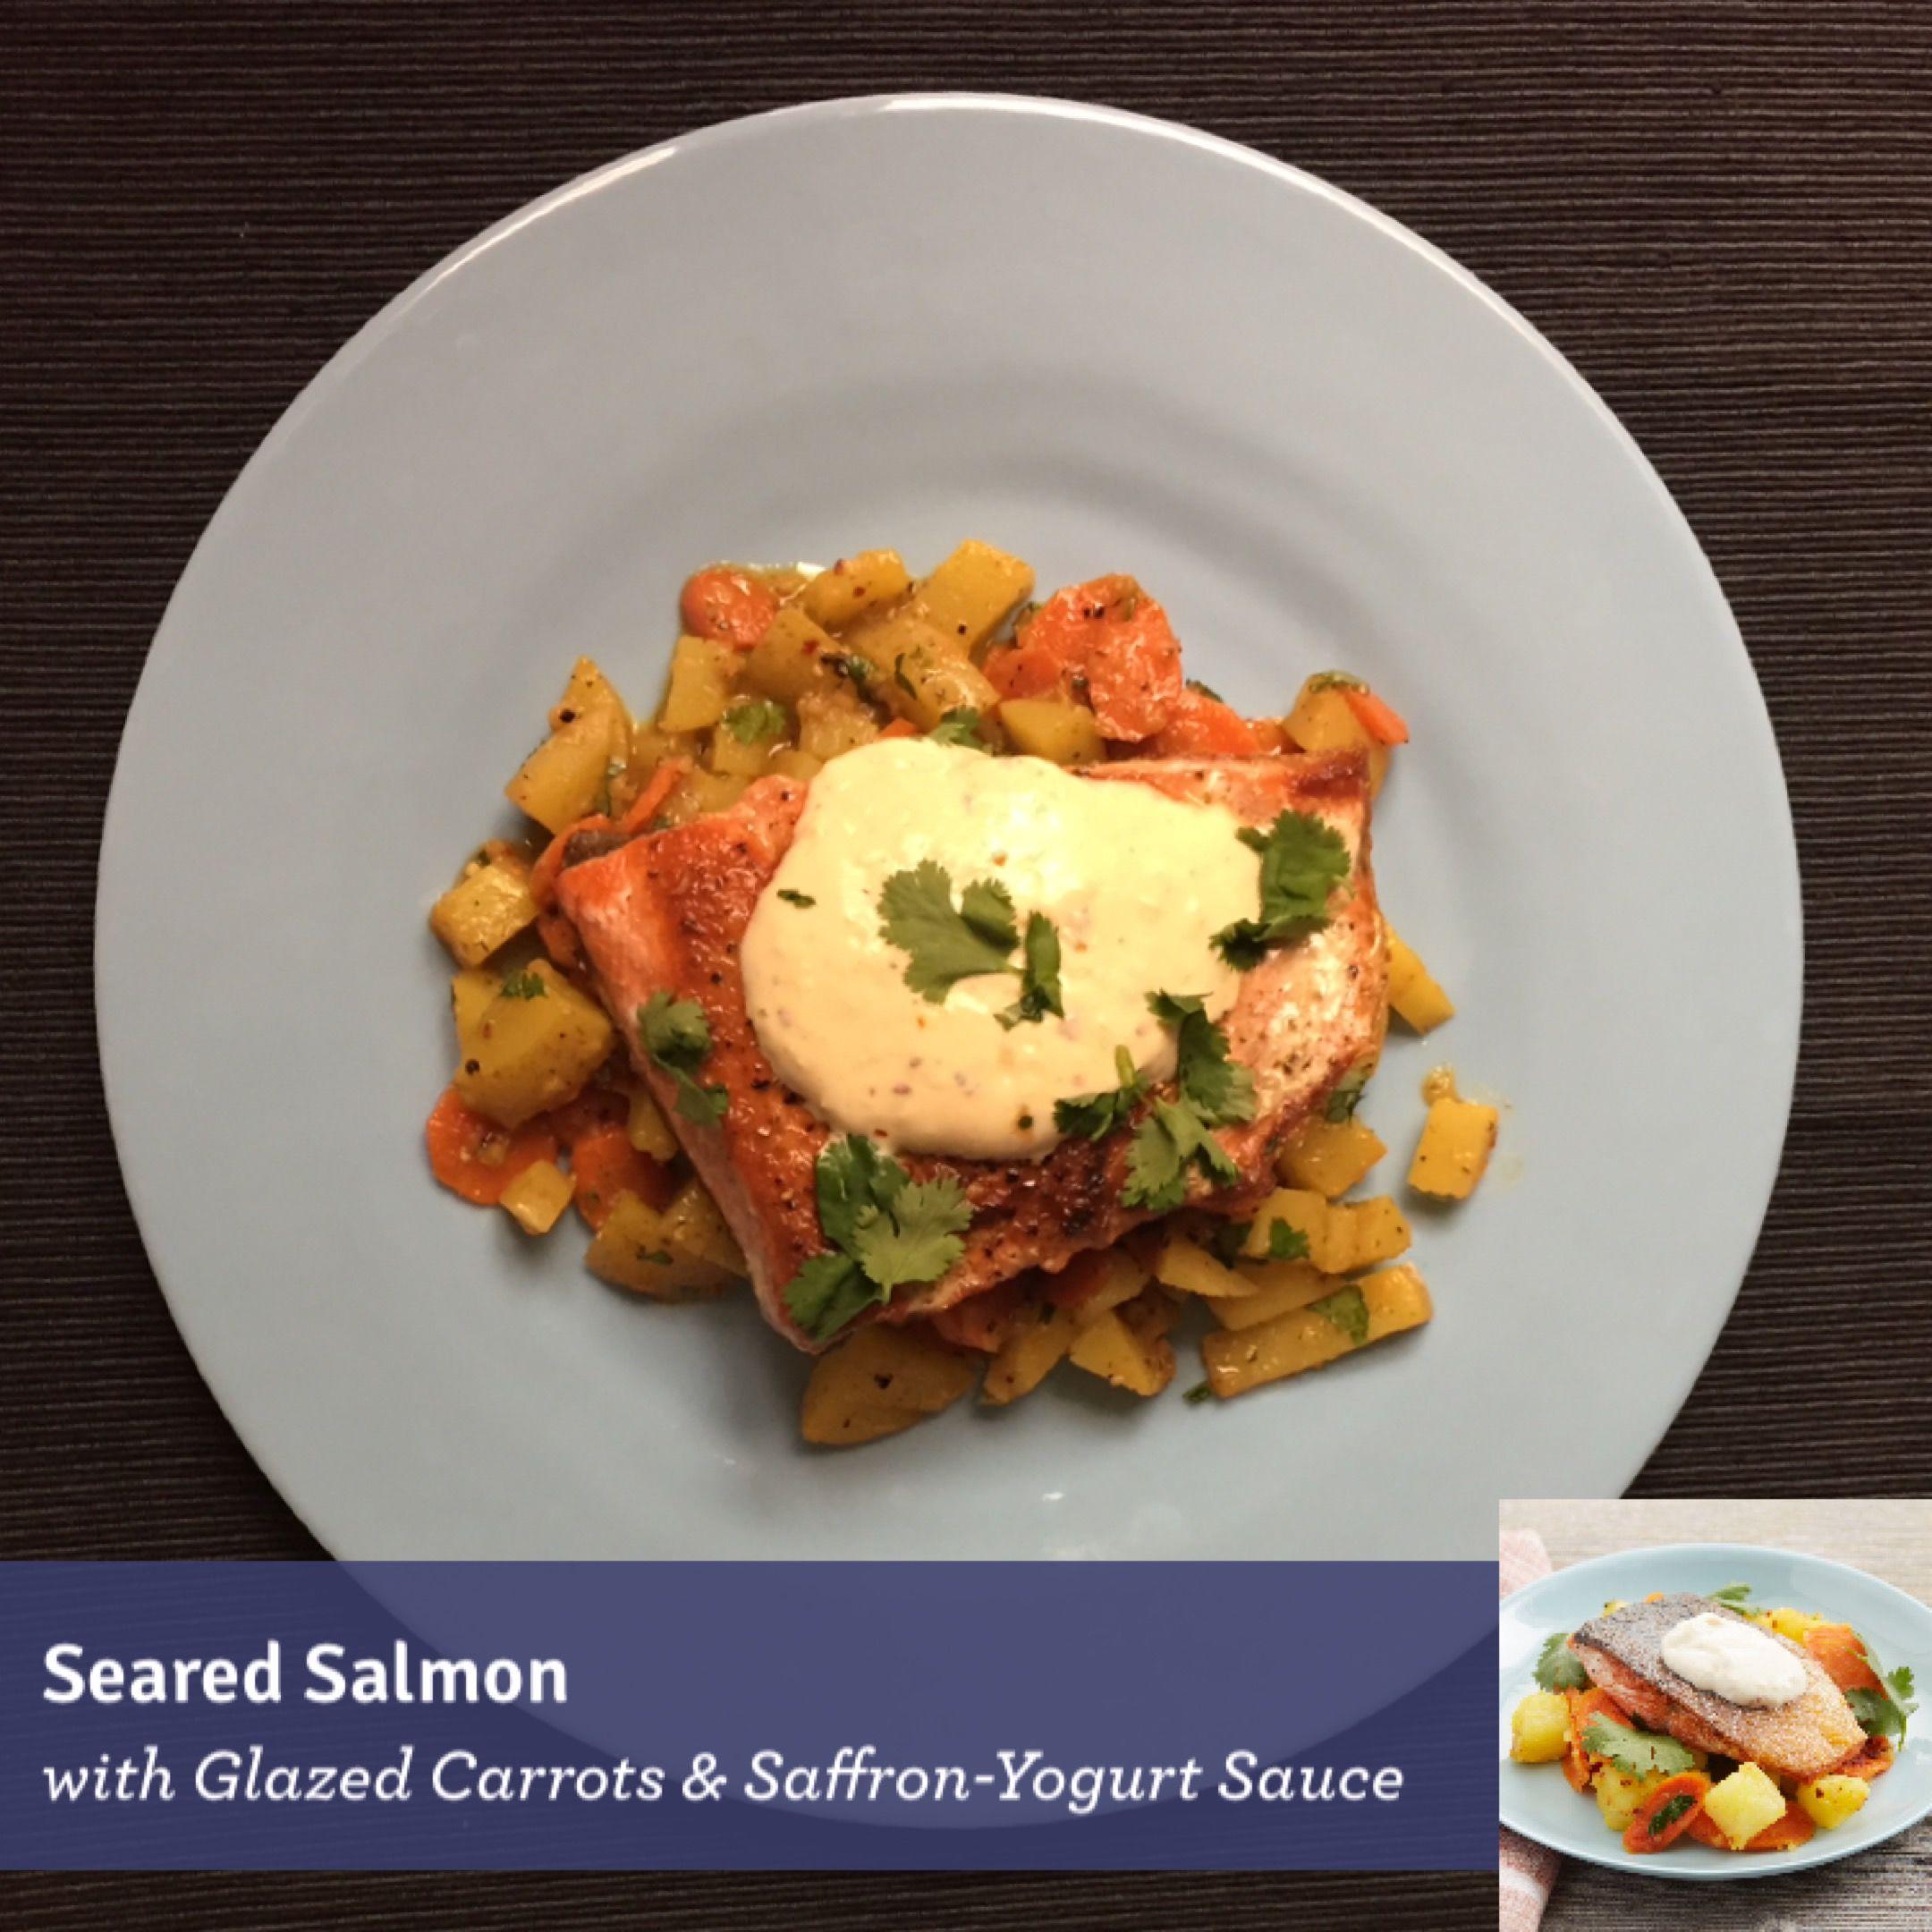 Blue apron salmon - Seared Salmon With Glazed Carrots Saffron Yogurt Sauce Http Dlink Glazed Carrotsblue Apronyogurt Sauce